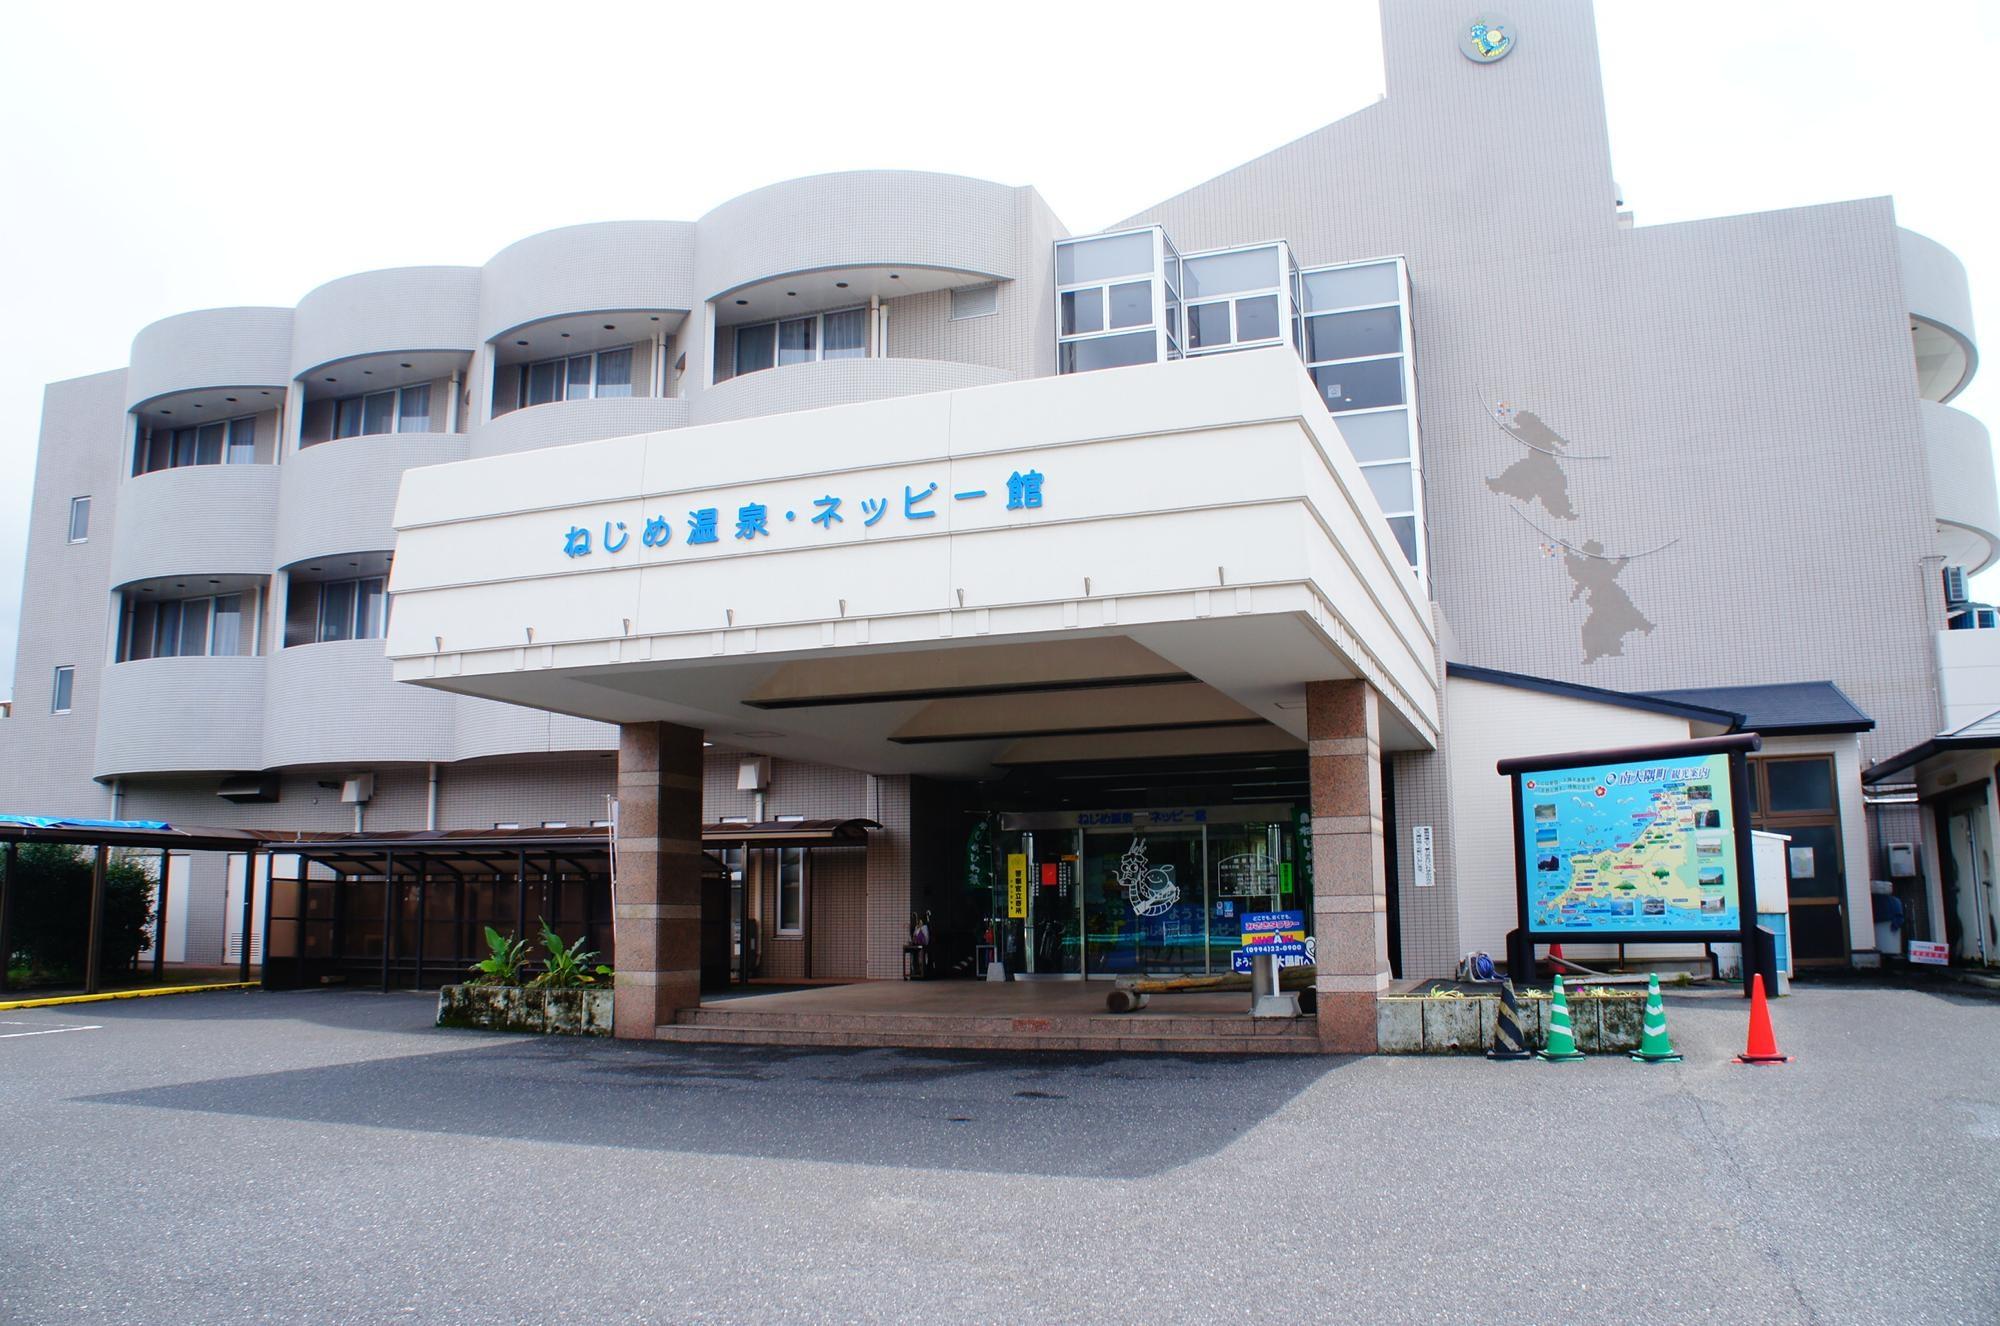 kagoshima_voyage_2015_DSC01205.jpg